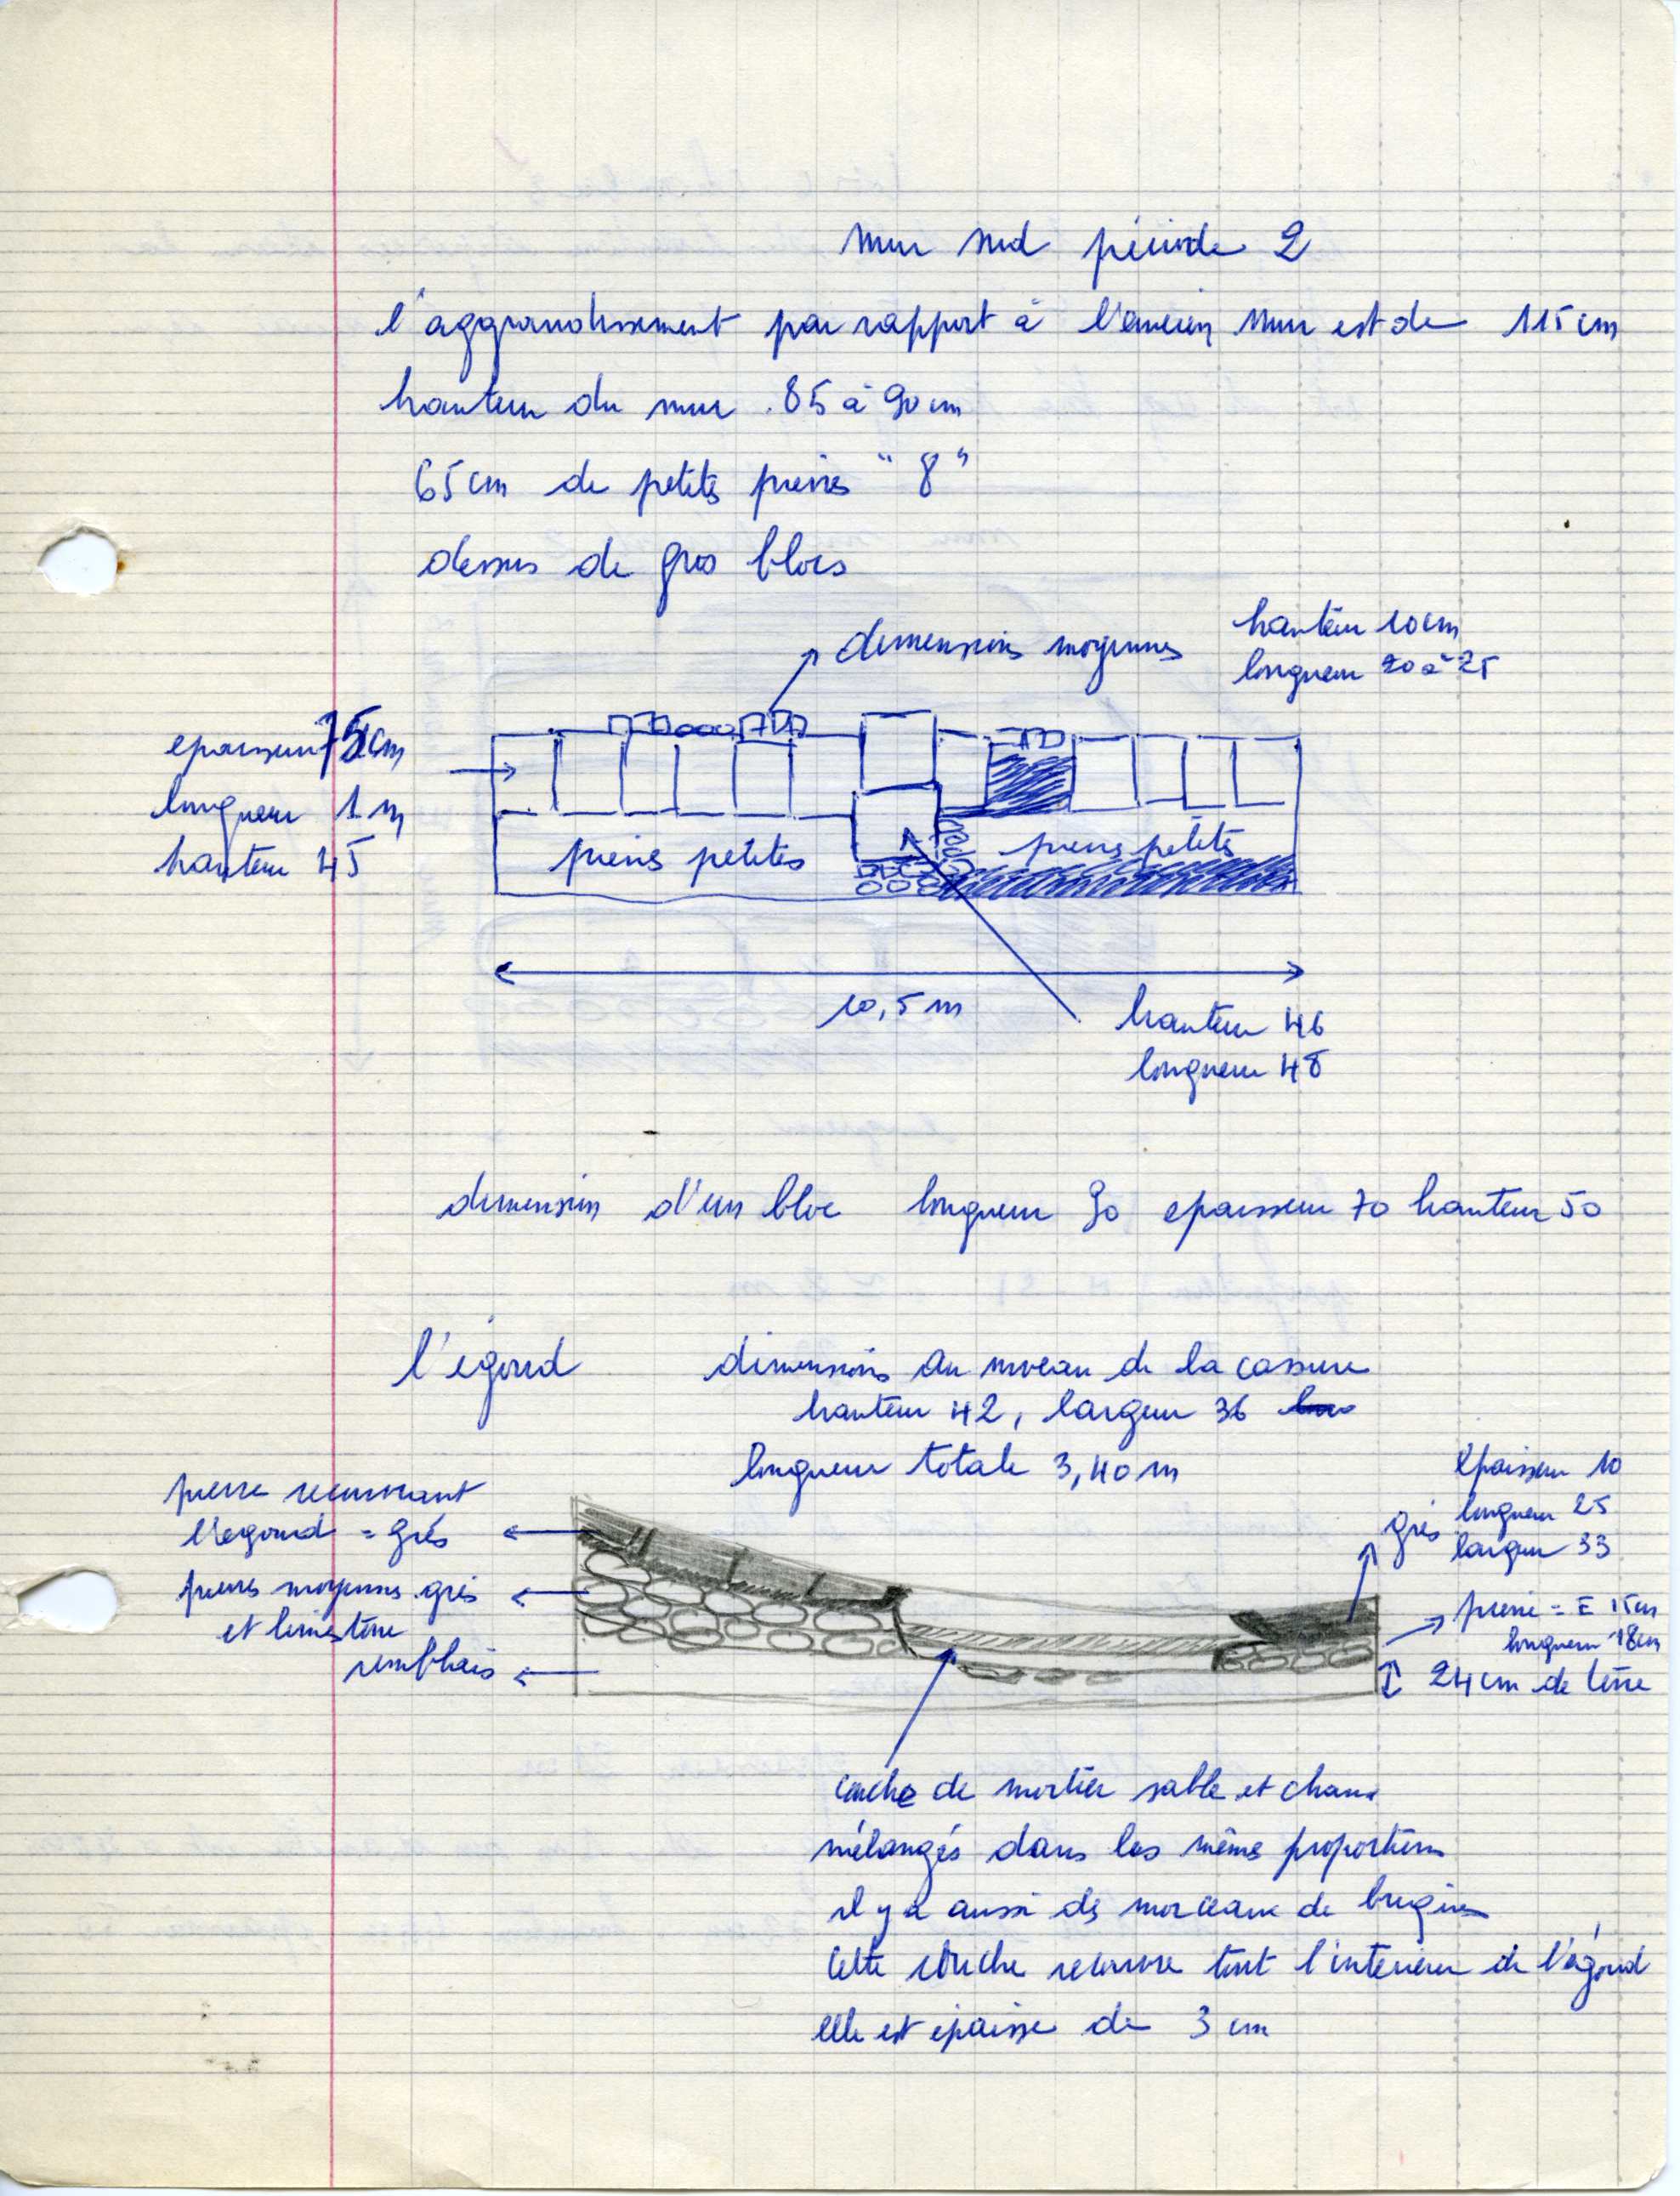 Field notebook page by David Soren and Guy P. R. Métraux, Utica, 1970